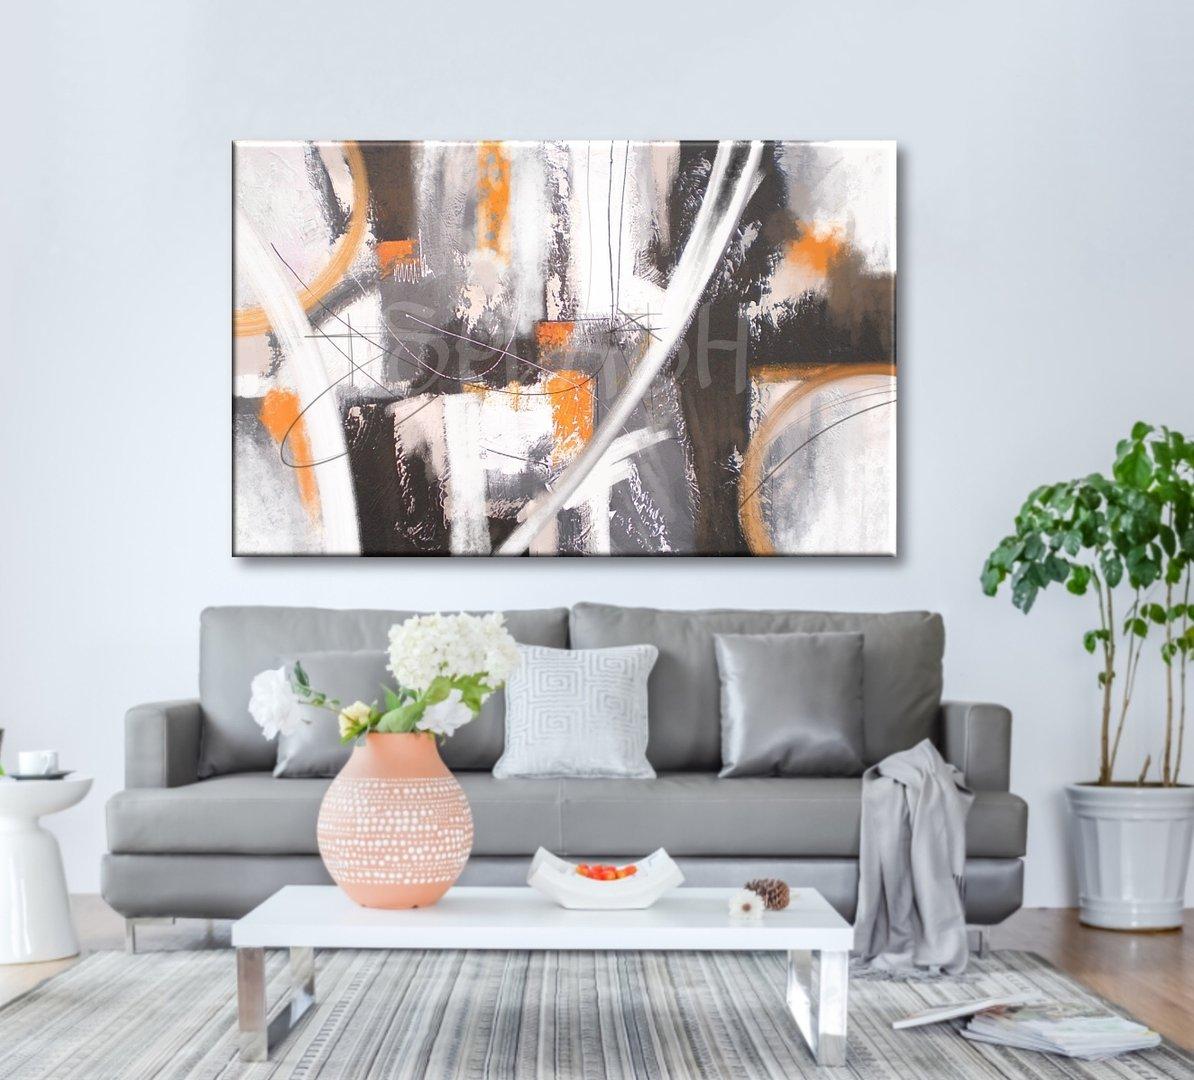 Cuadros abstractos blanco gris ocre texturas modernos - Decoracion de cuadros ...